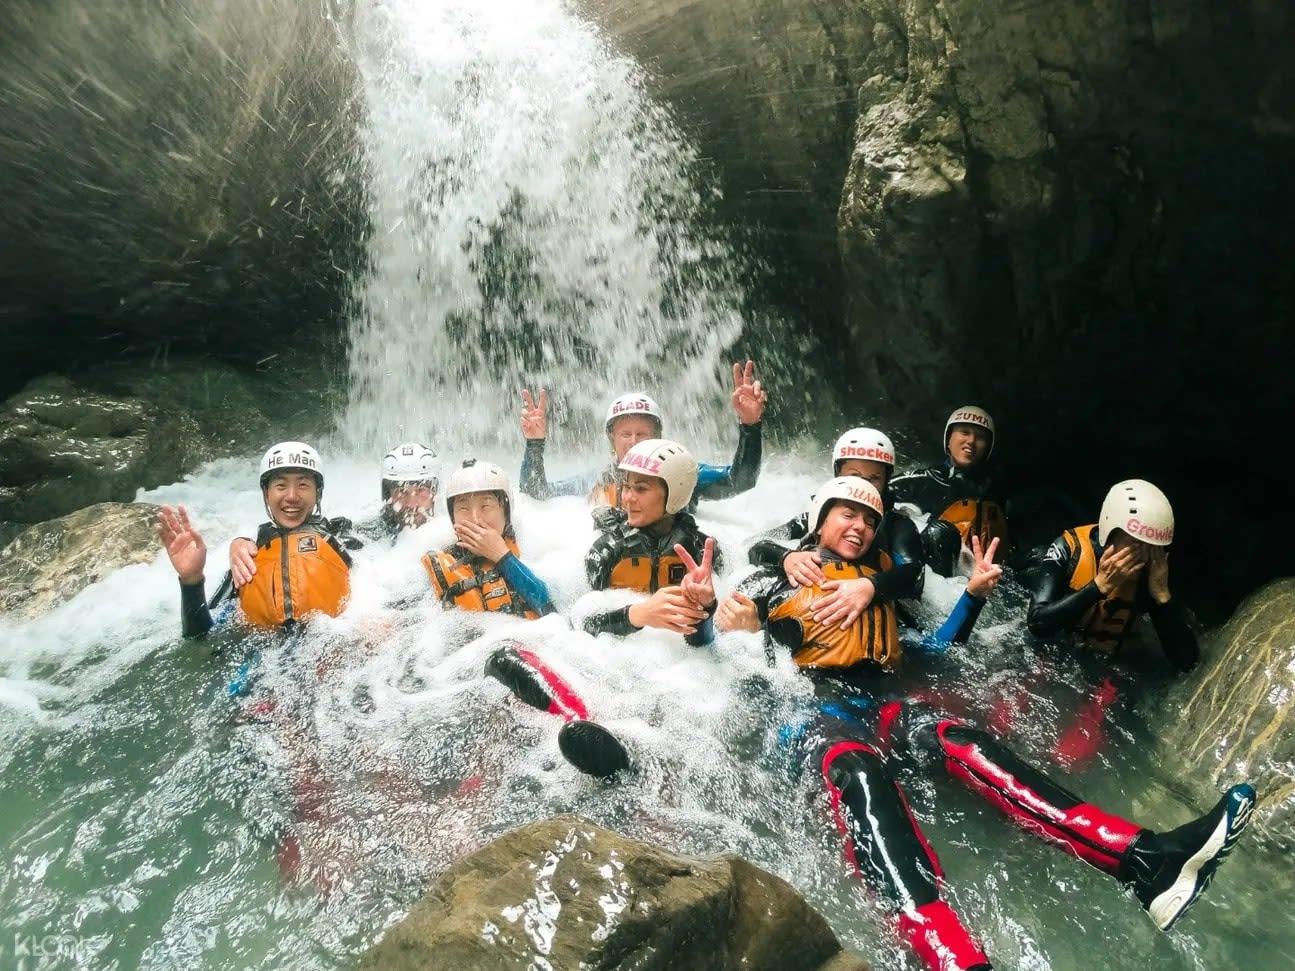 canyoning adventure tour in switzerland